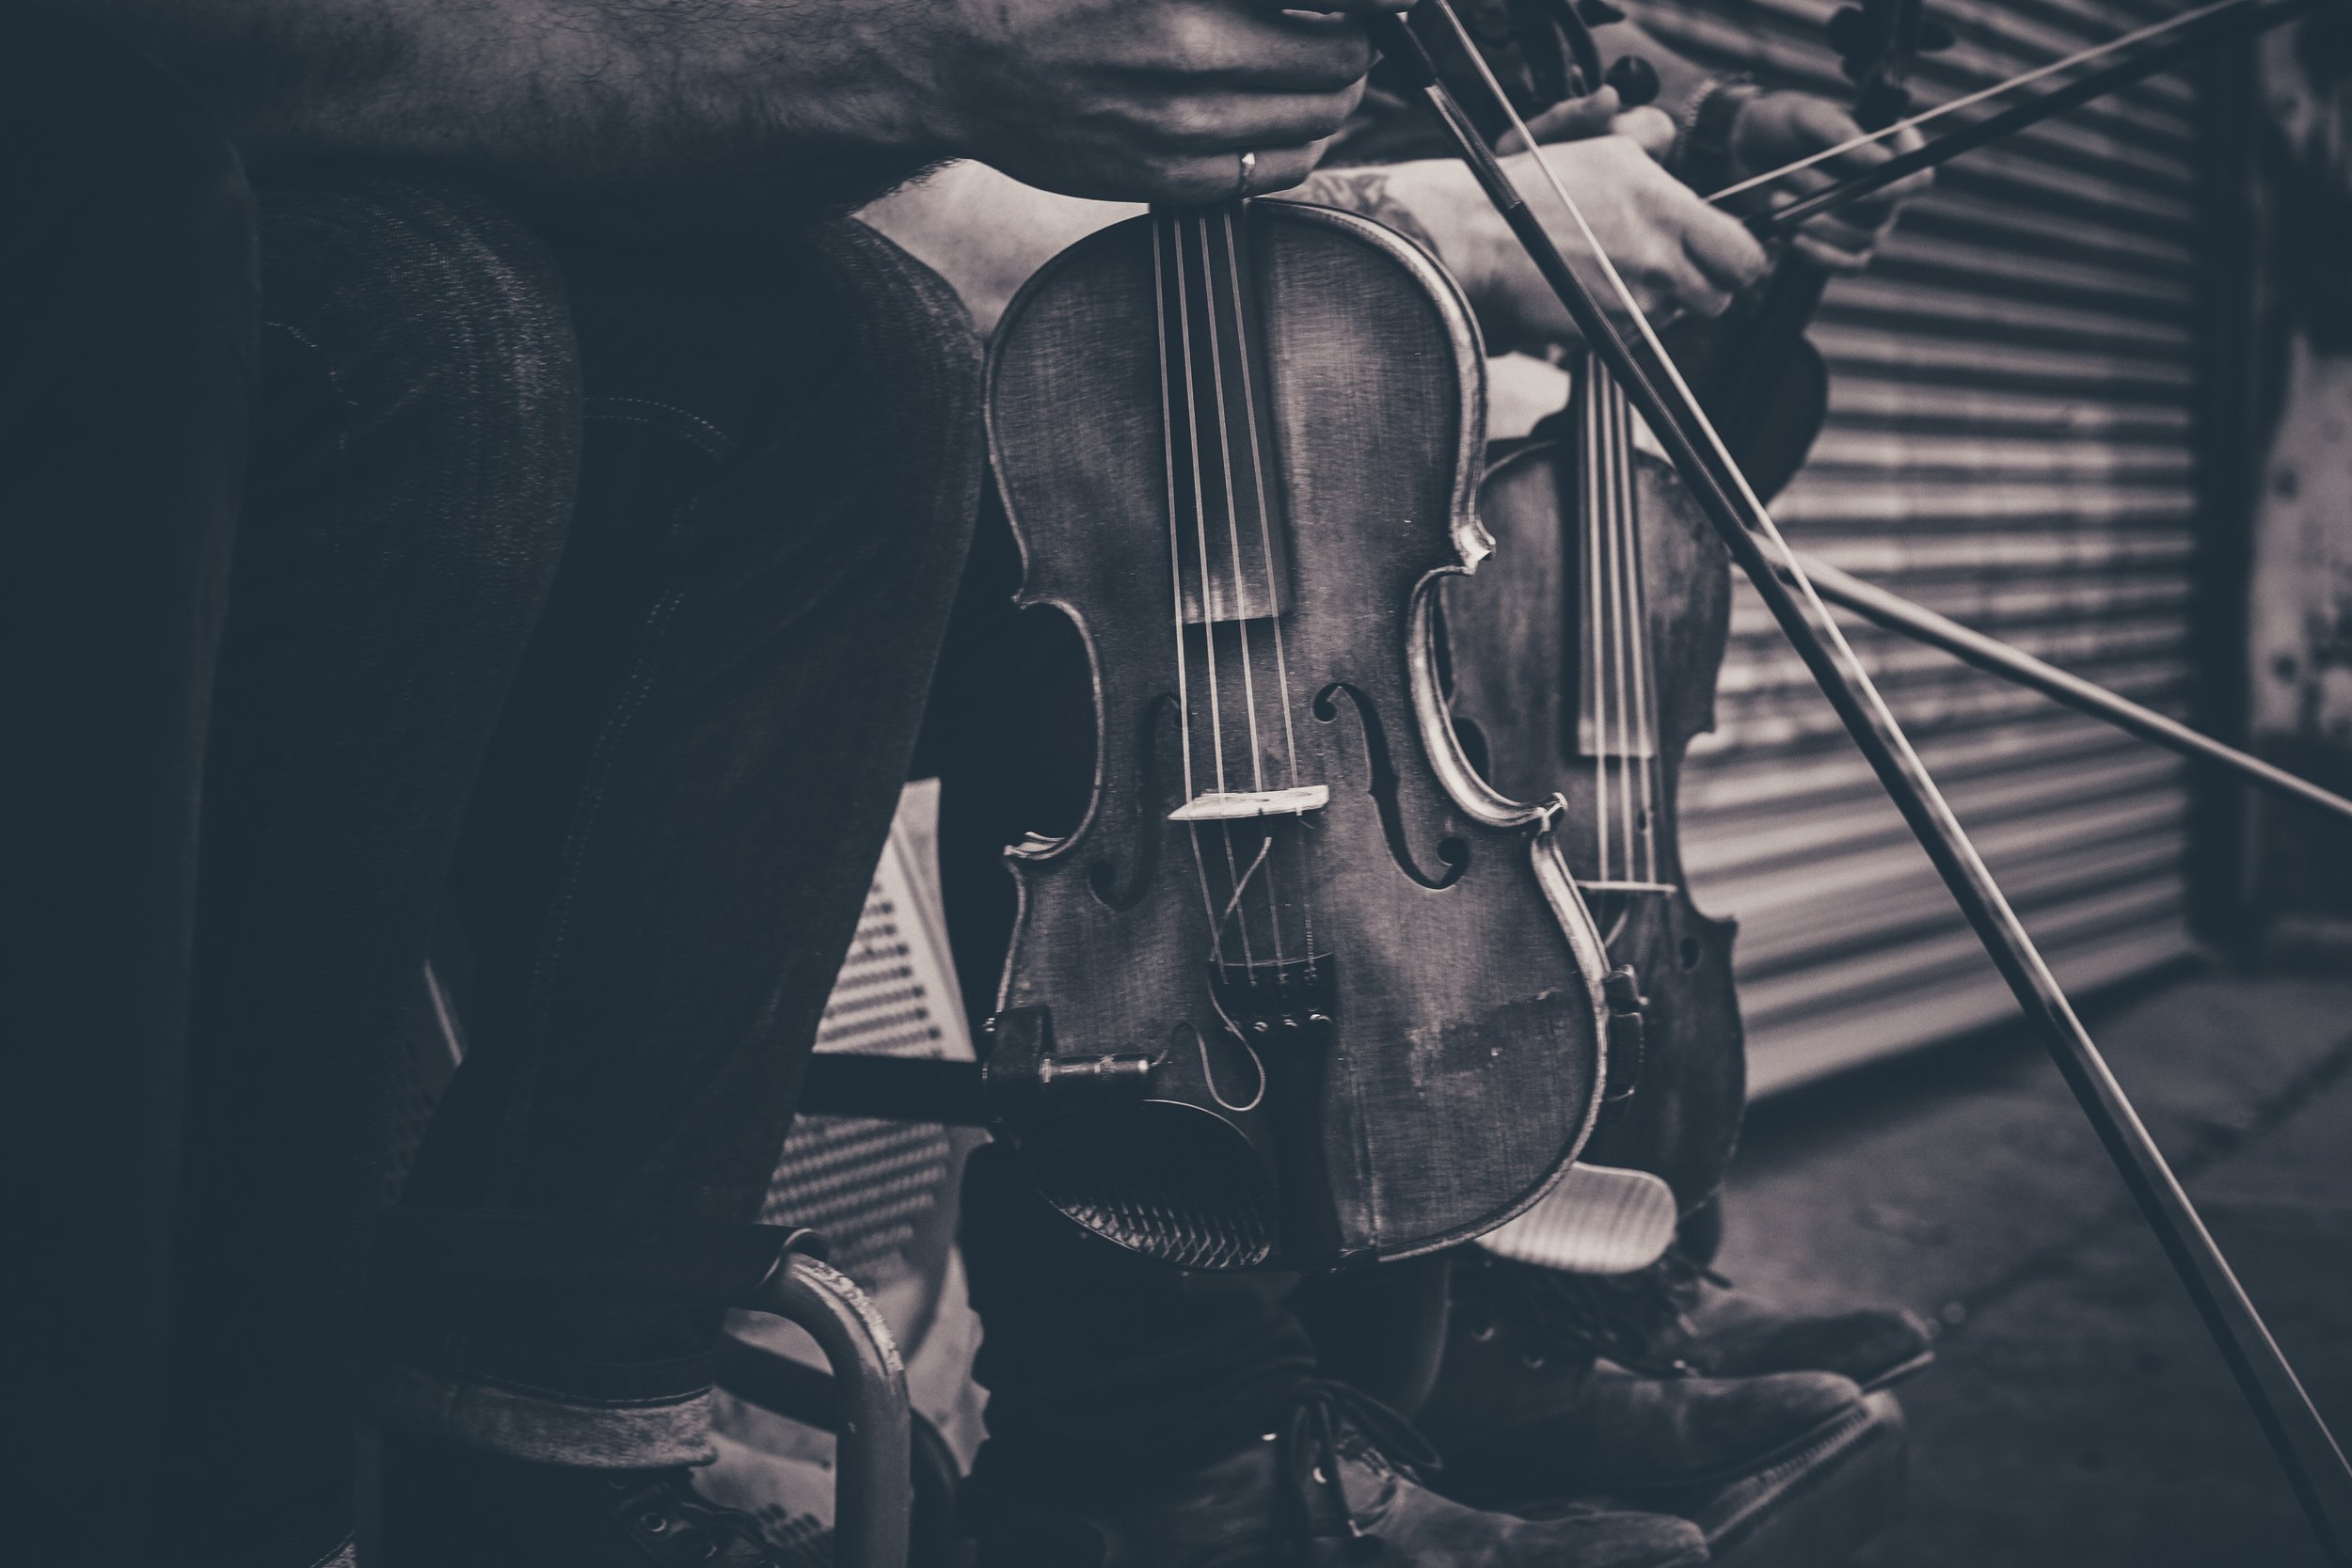 3. Fretless - Fiddles.jpg